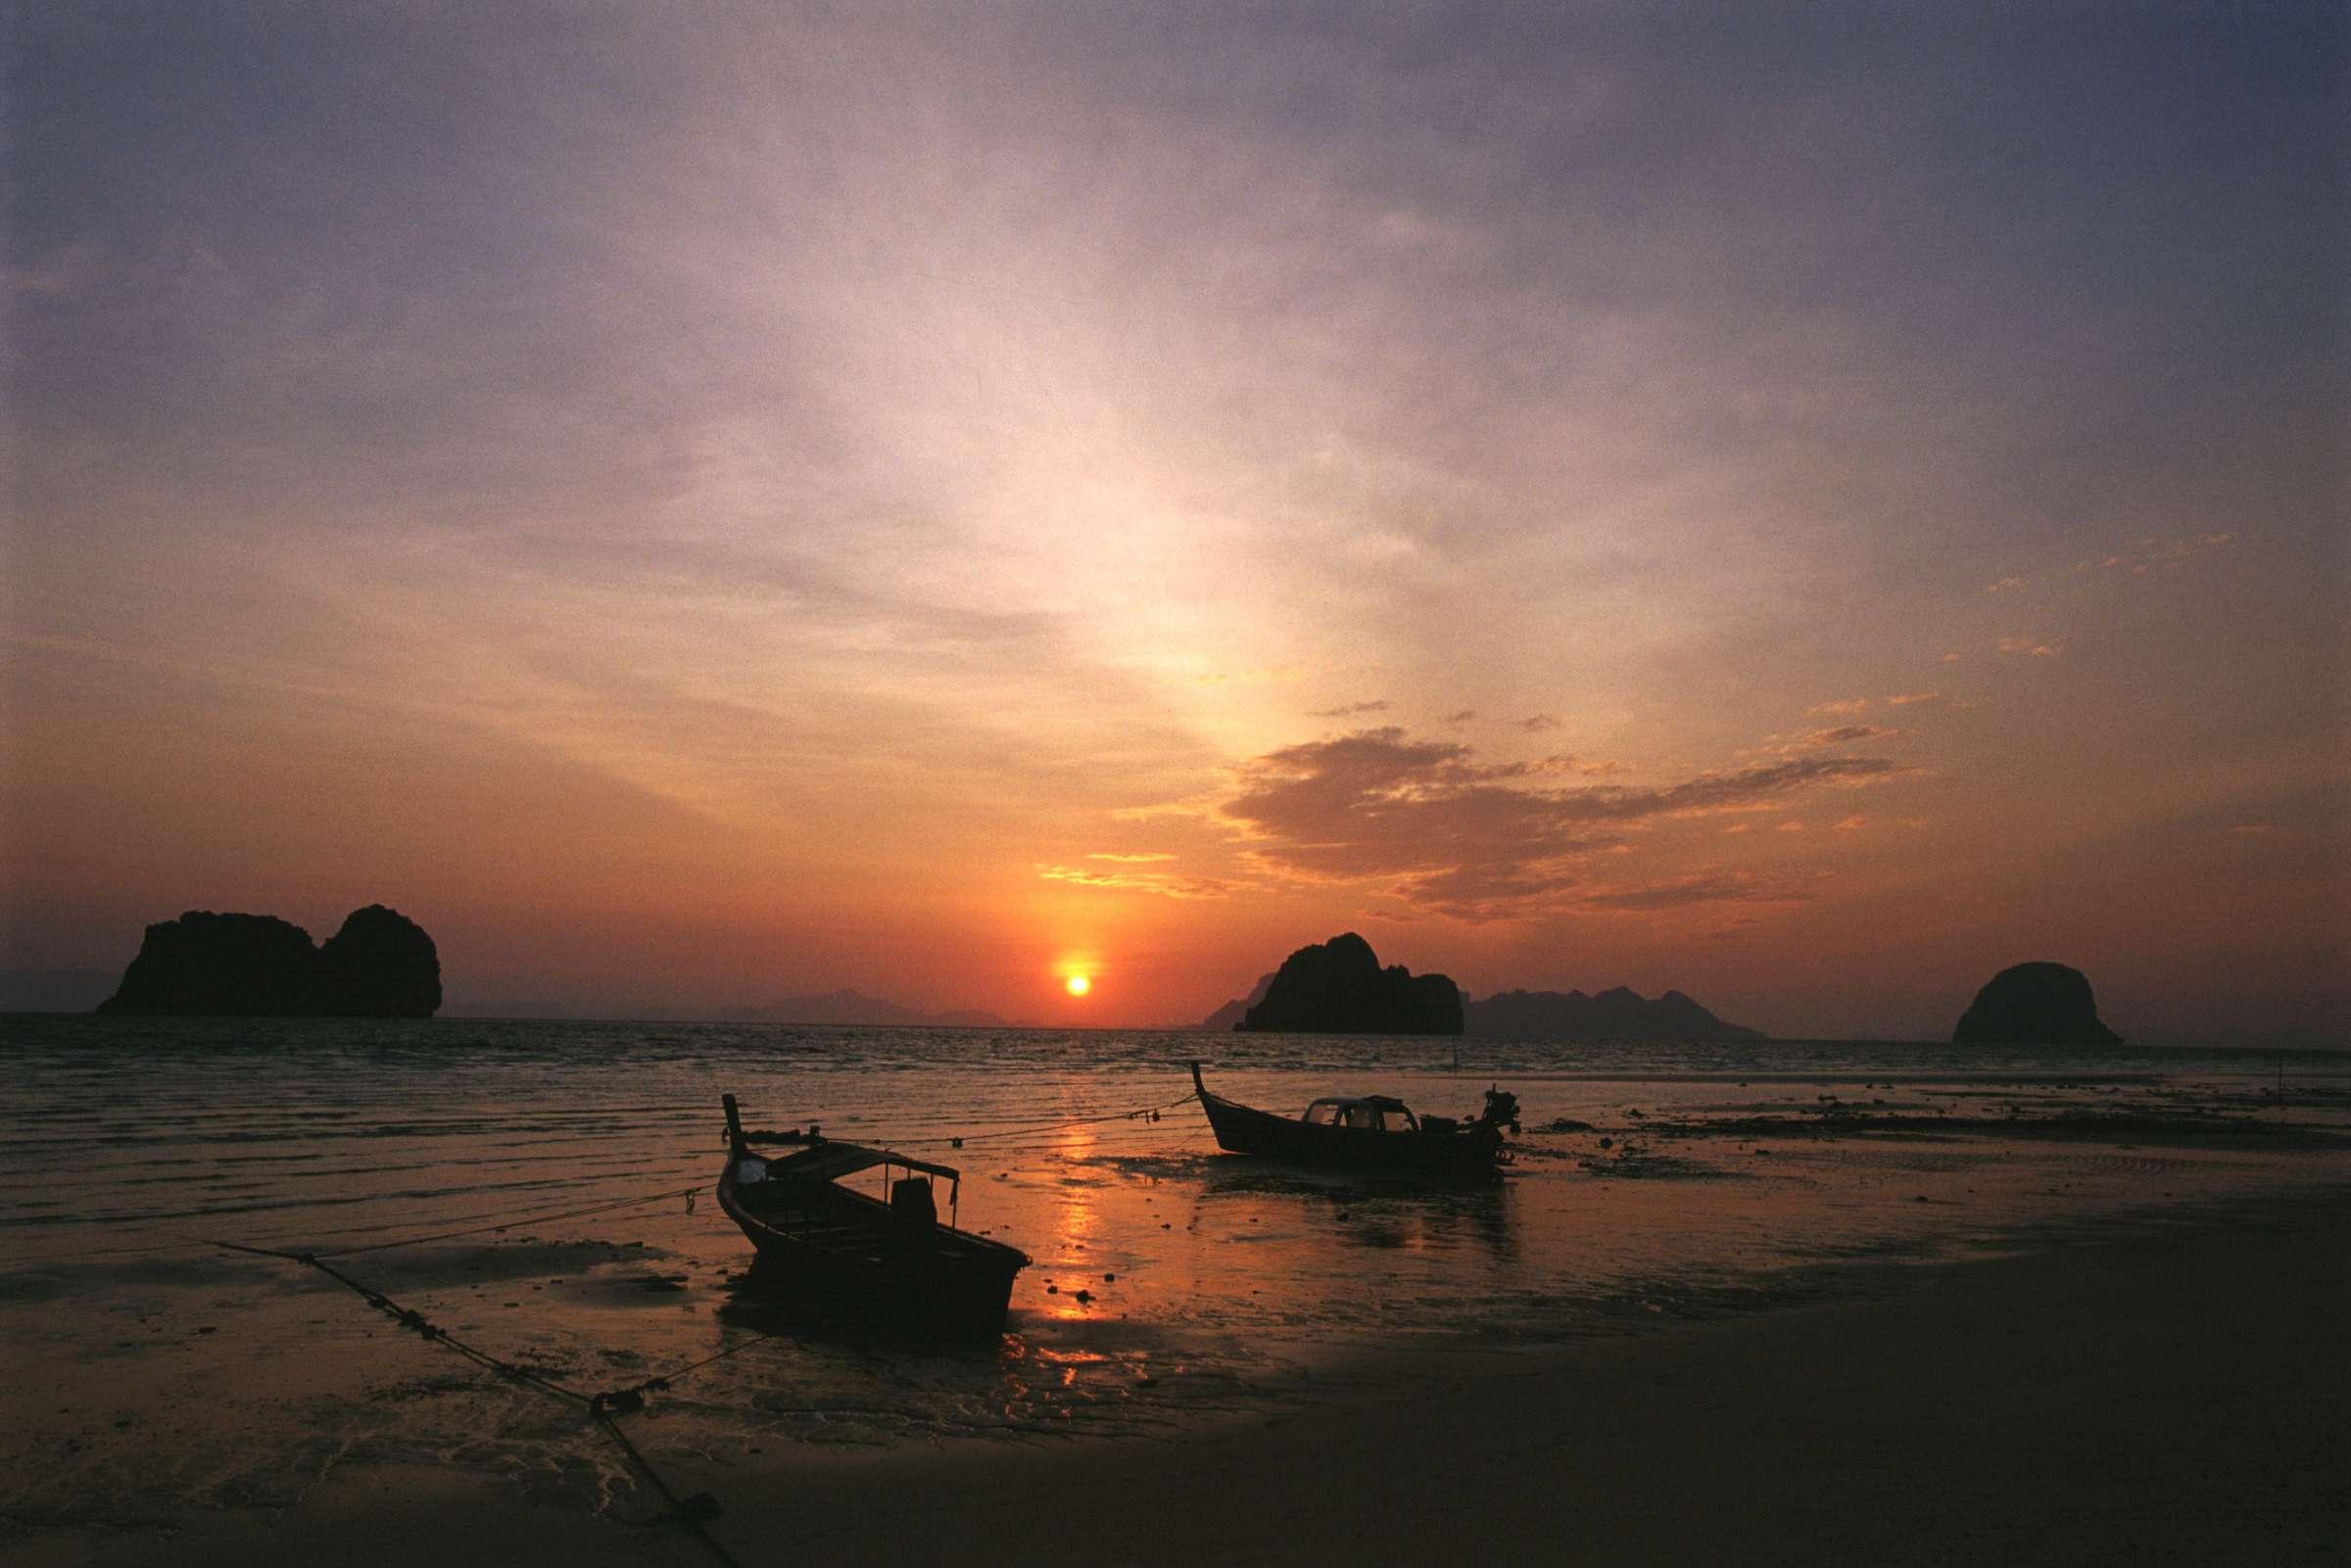 Trang sunset Thailand